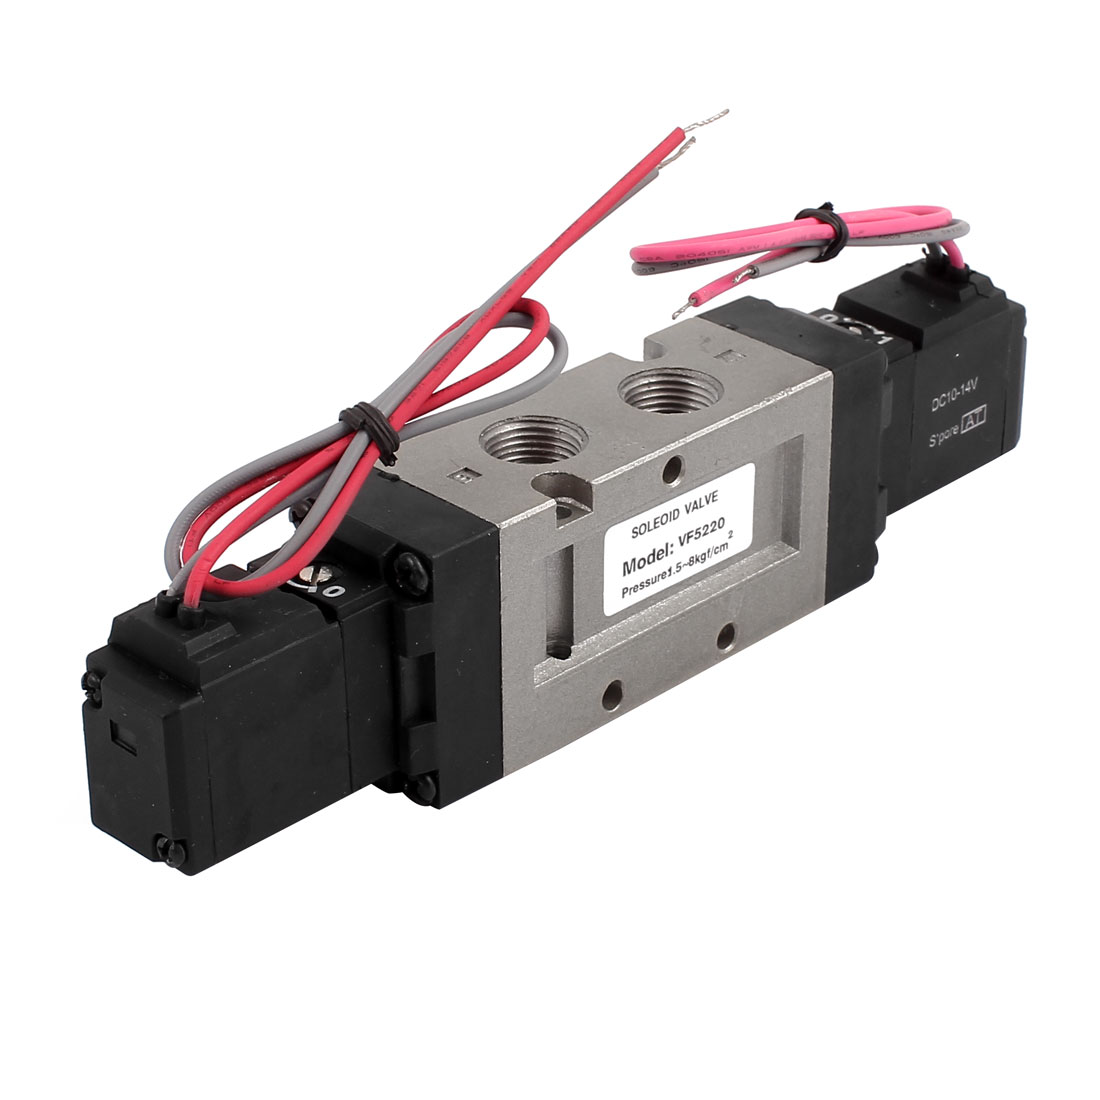 DC 12V 2 Position 5 Way 4 Wires Pneumatic Solenoid Valve VF5220-6GB